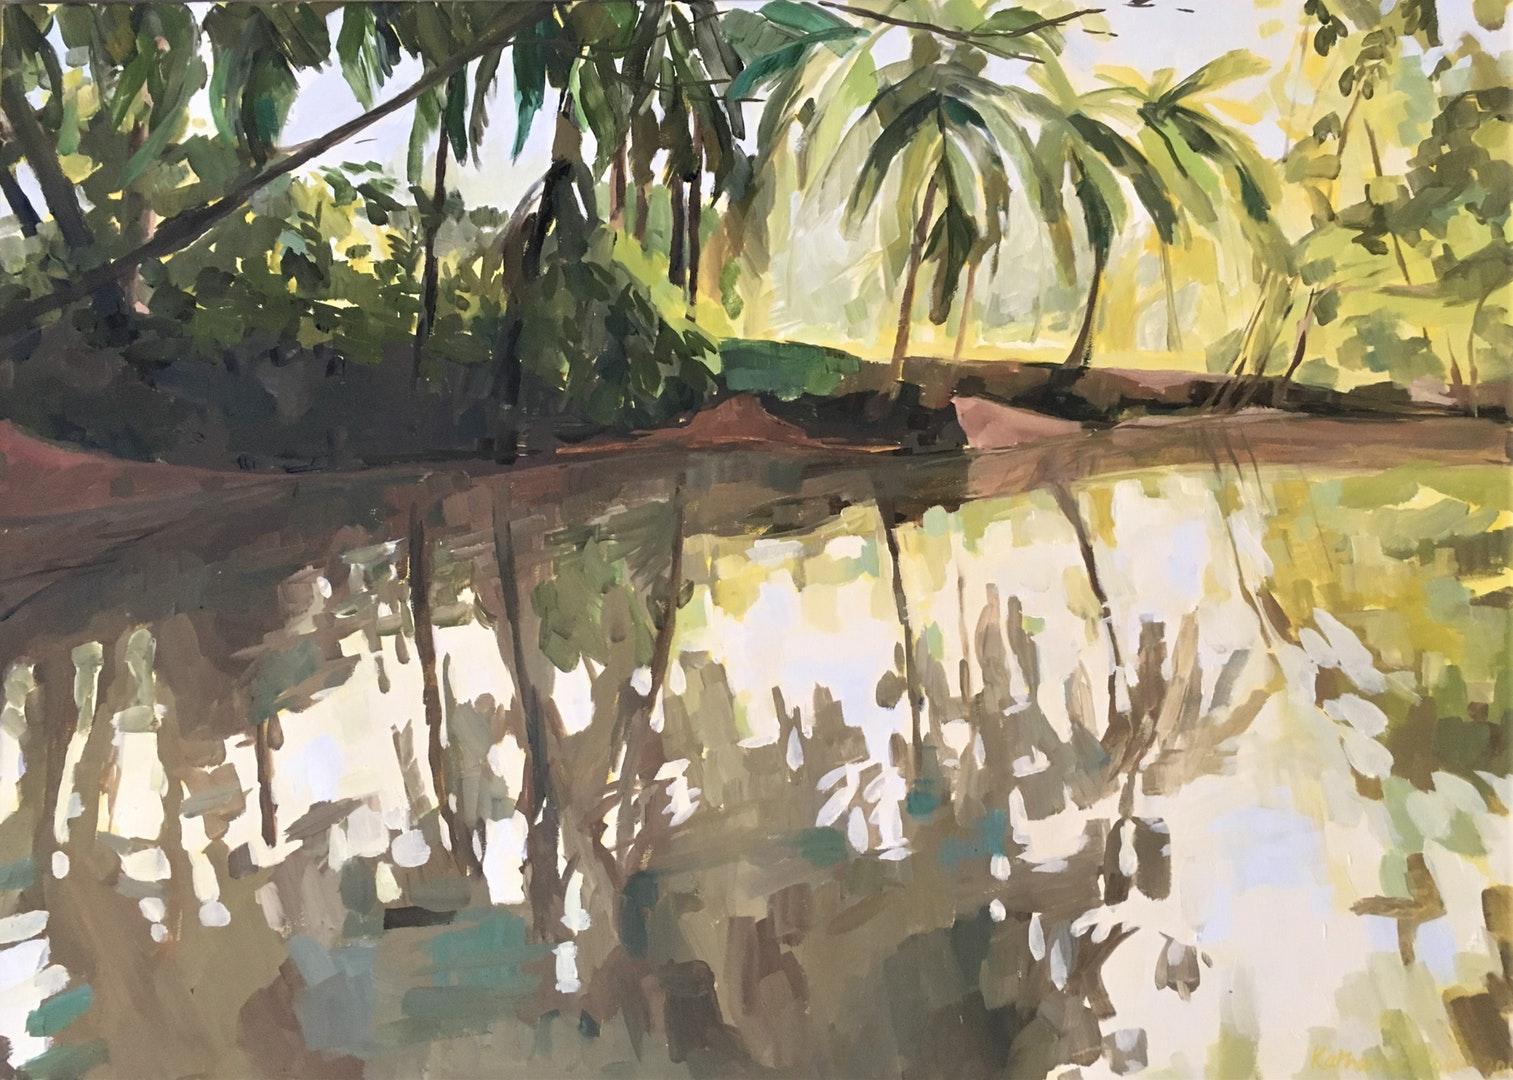 'Mangroves near Quepos', Costa Rica, Katharine Rowe, Oil on canvas, 70 x 50 x 2 cm